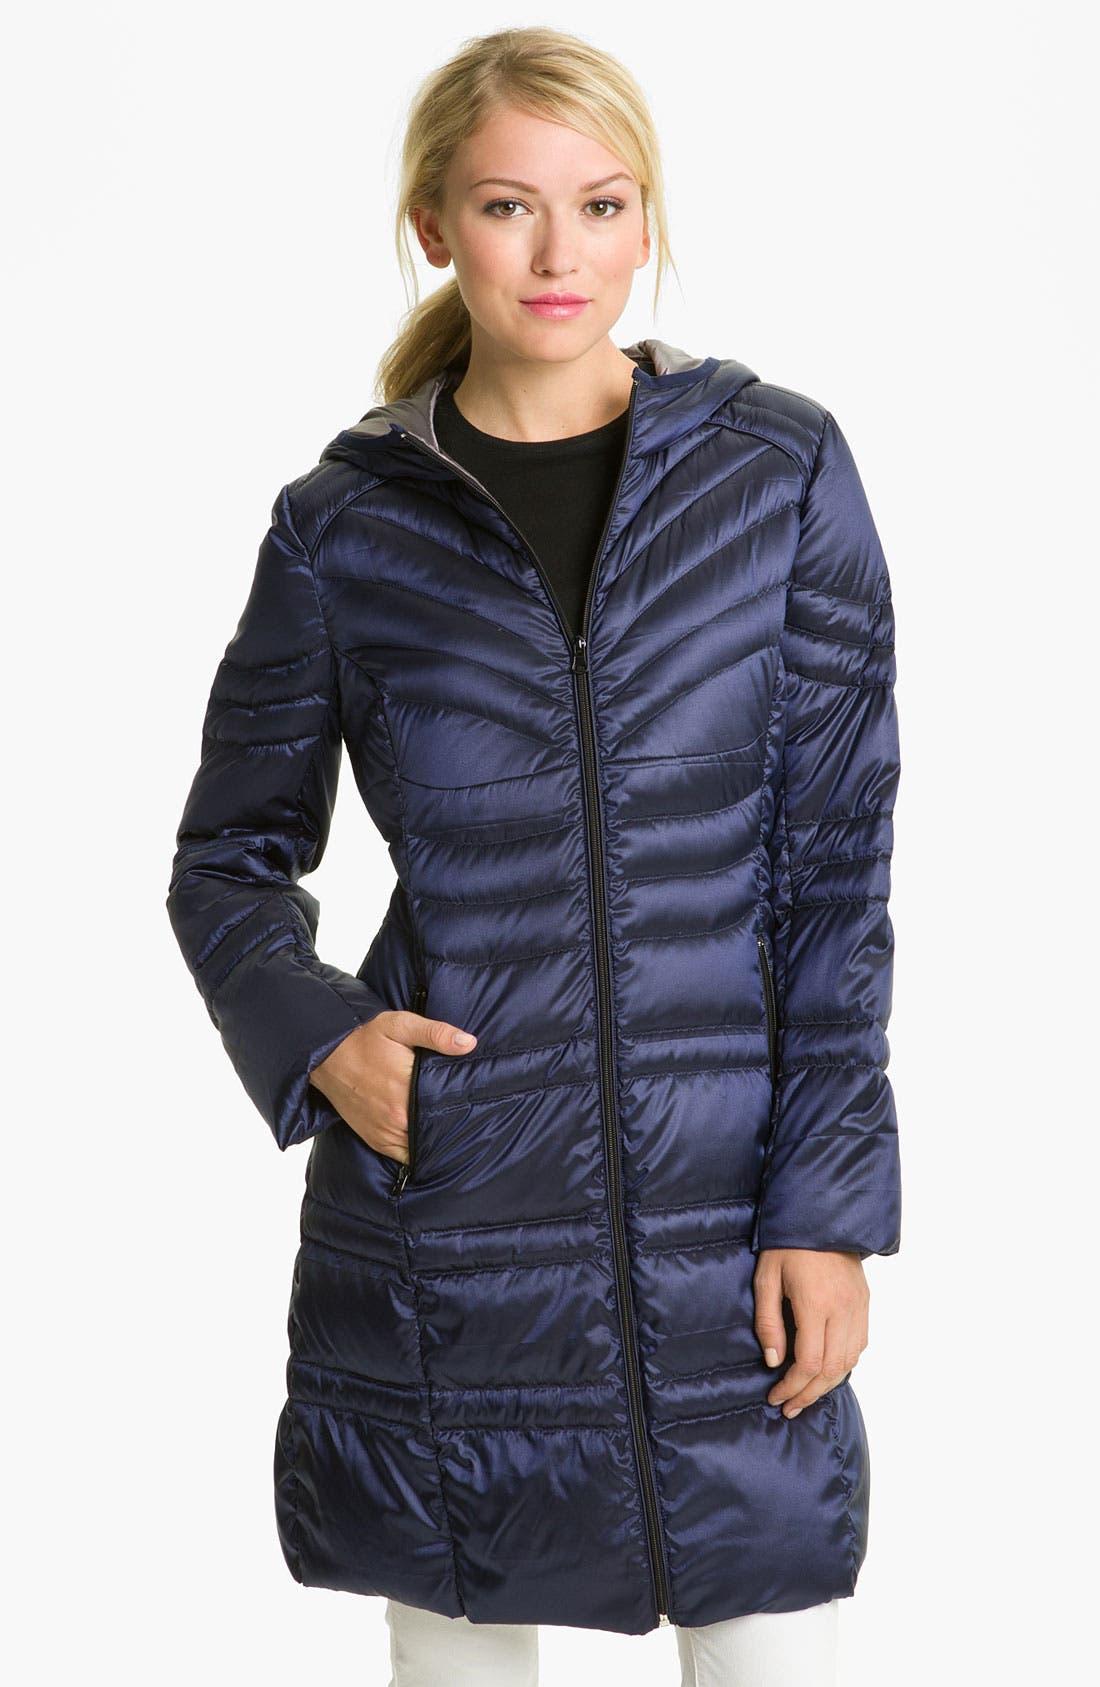 Alternate Image 1 Selected - Bernardo Lightweight Hooded Walking Coat